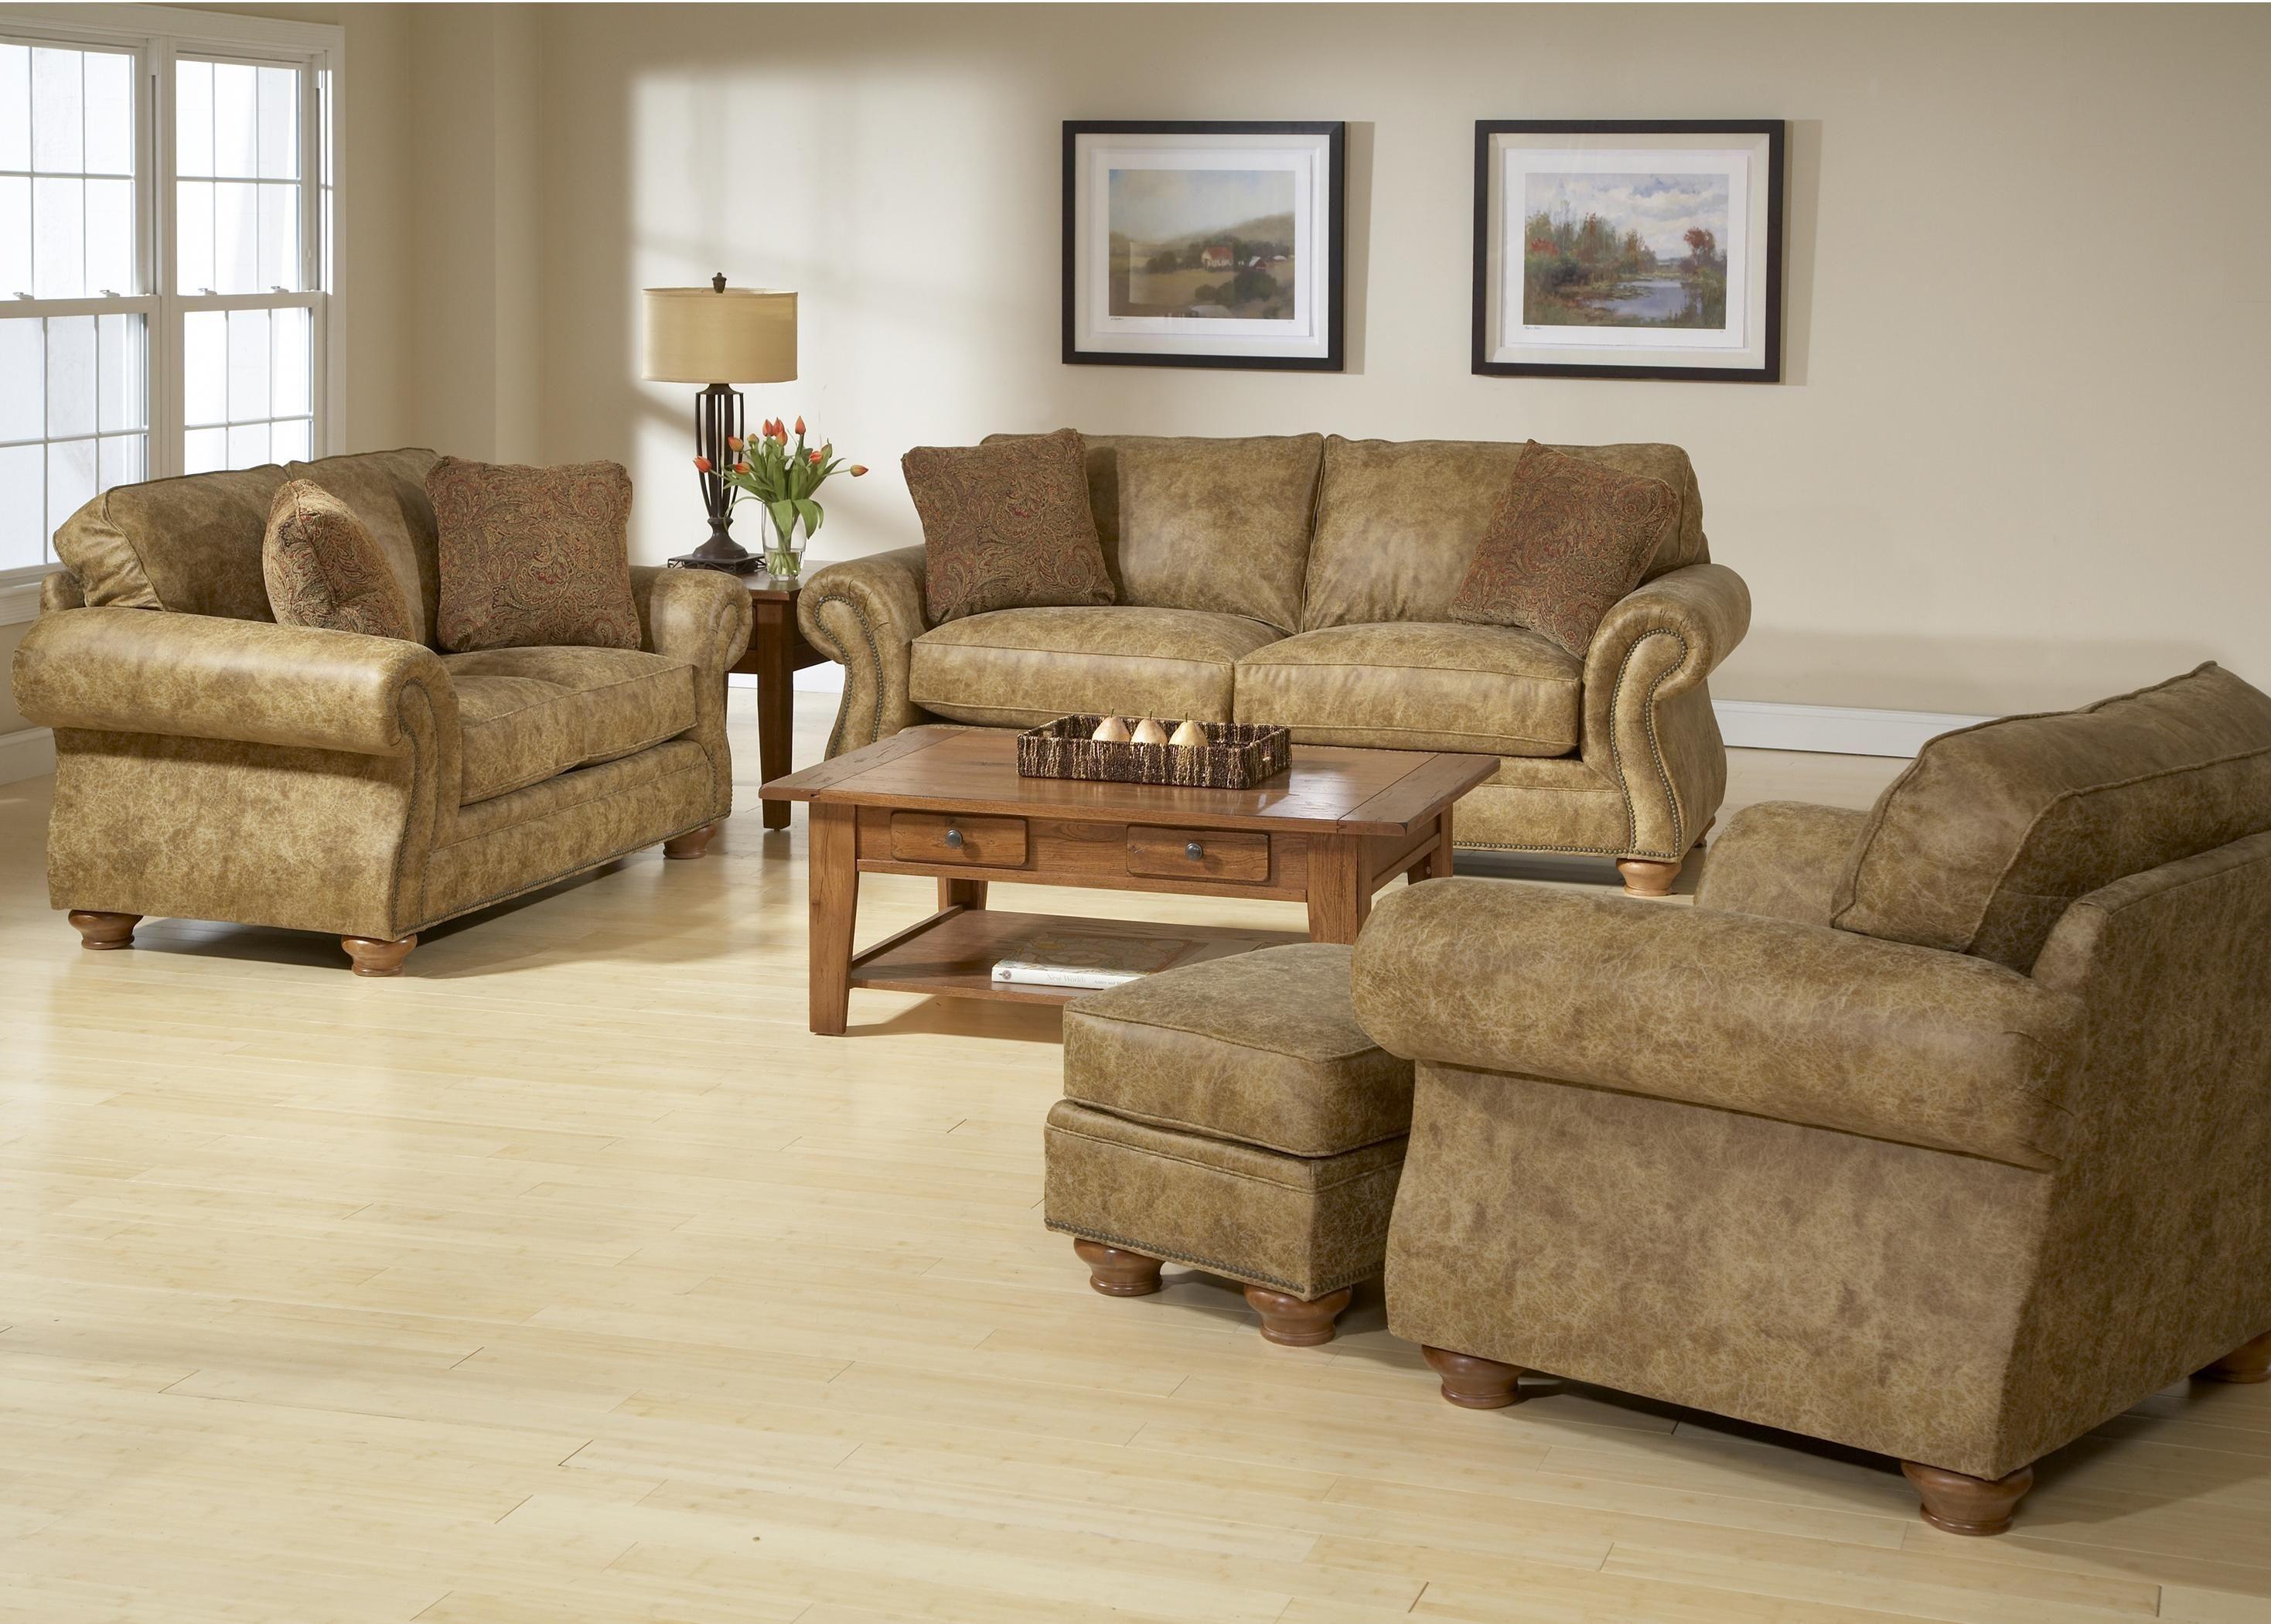 Broyhill Furniture Laramie Collection featuring sofa sofa sleeper